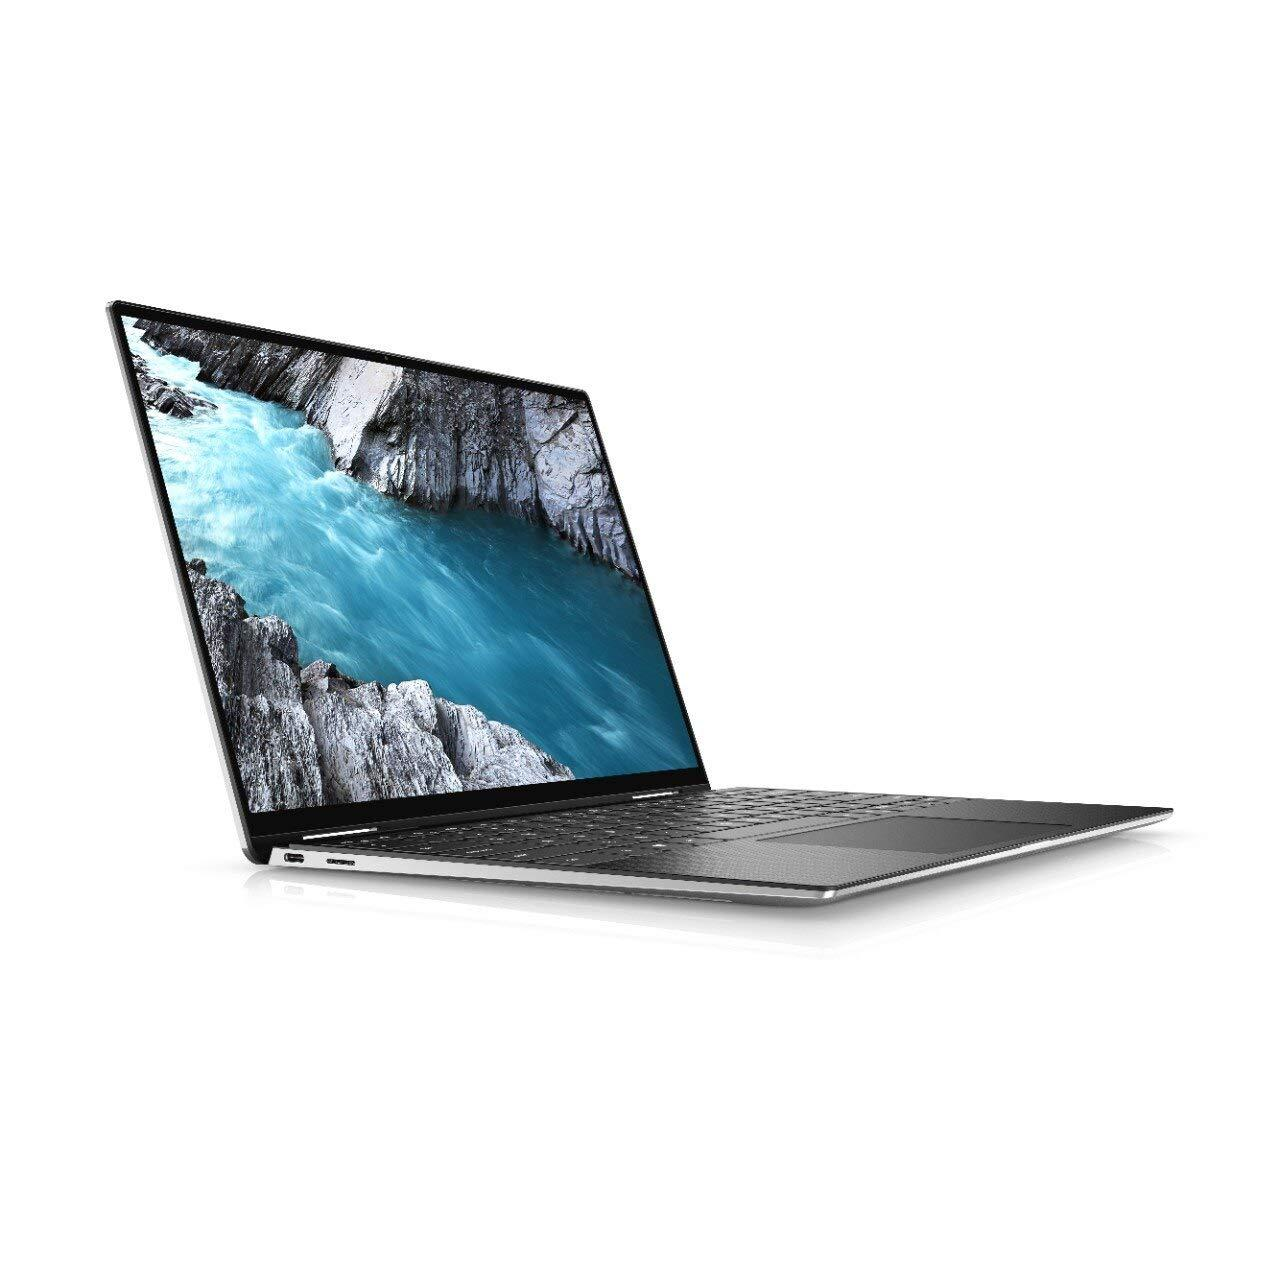 Ноутбук Dell XPS 13 7390 Black